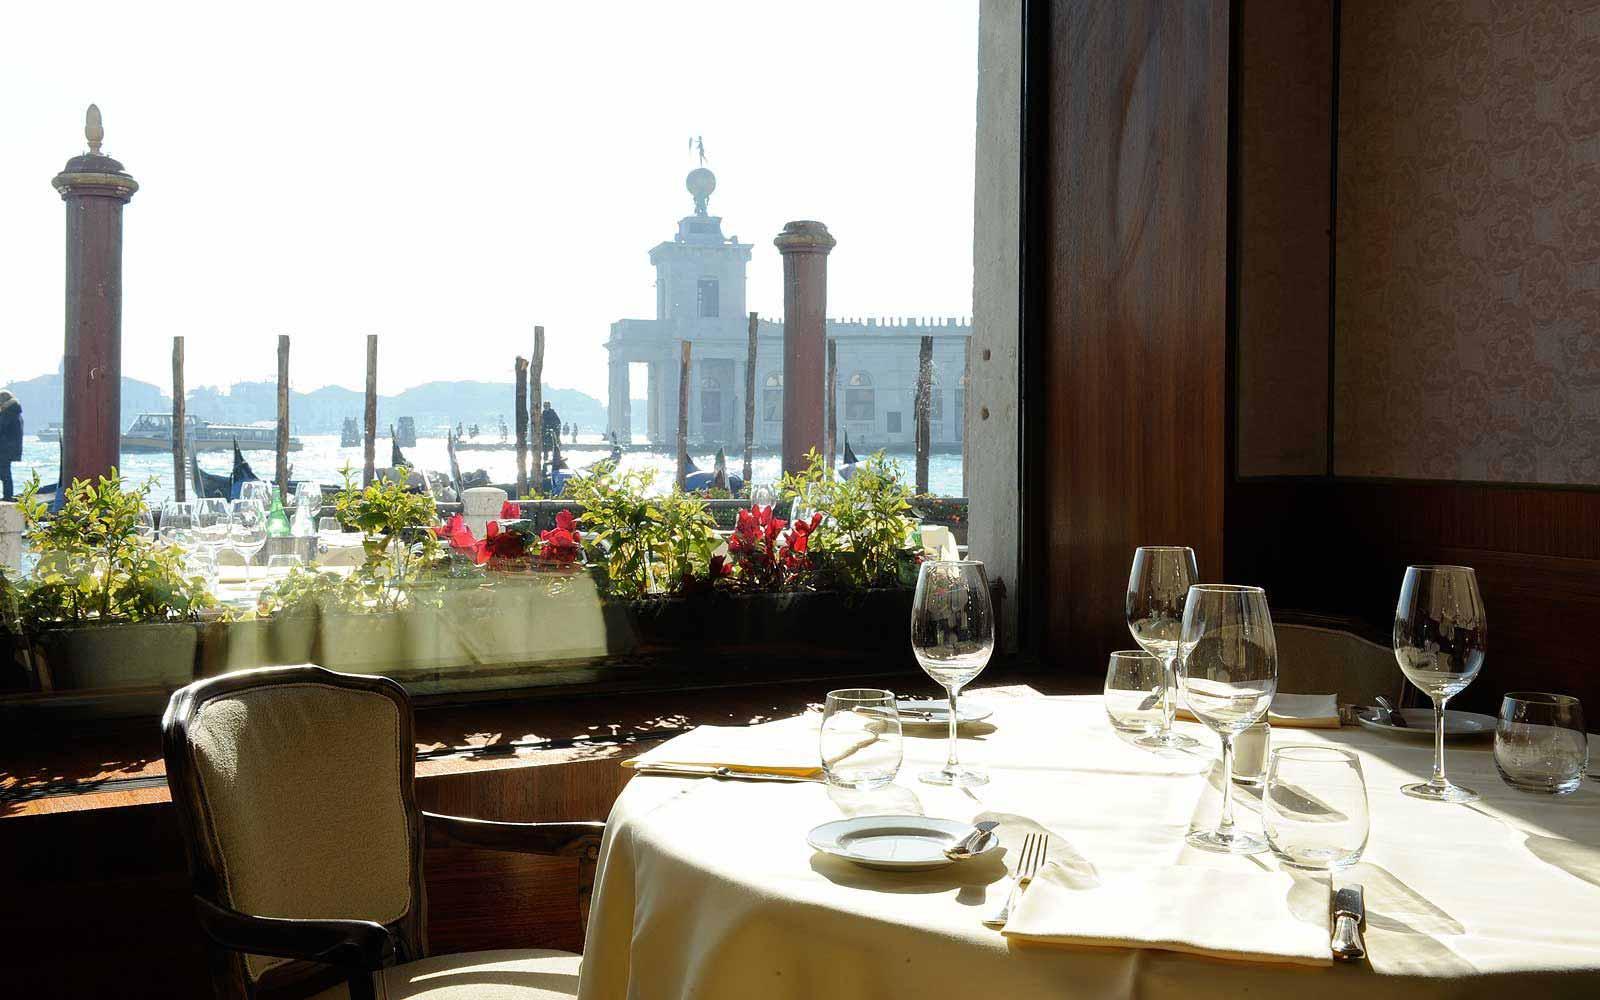 Restaurant at Monaco & Grand Canal